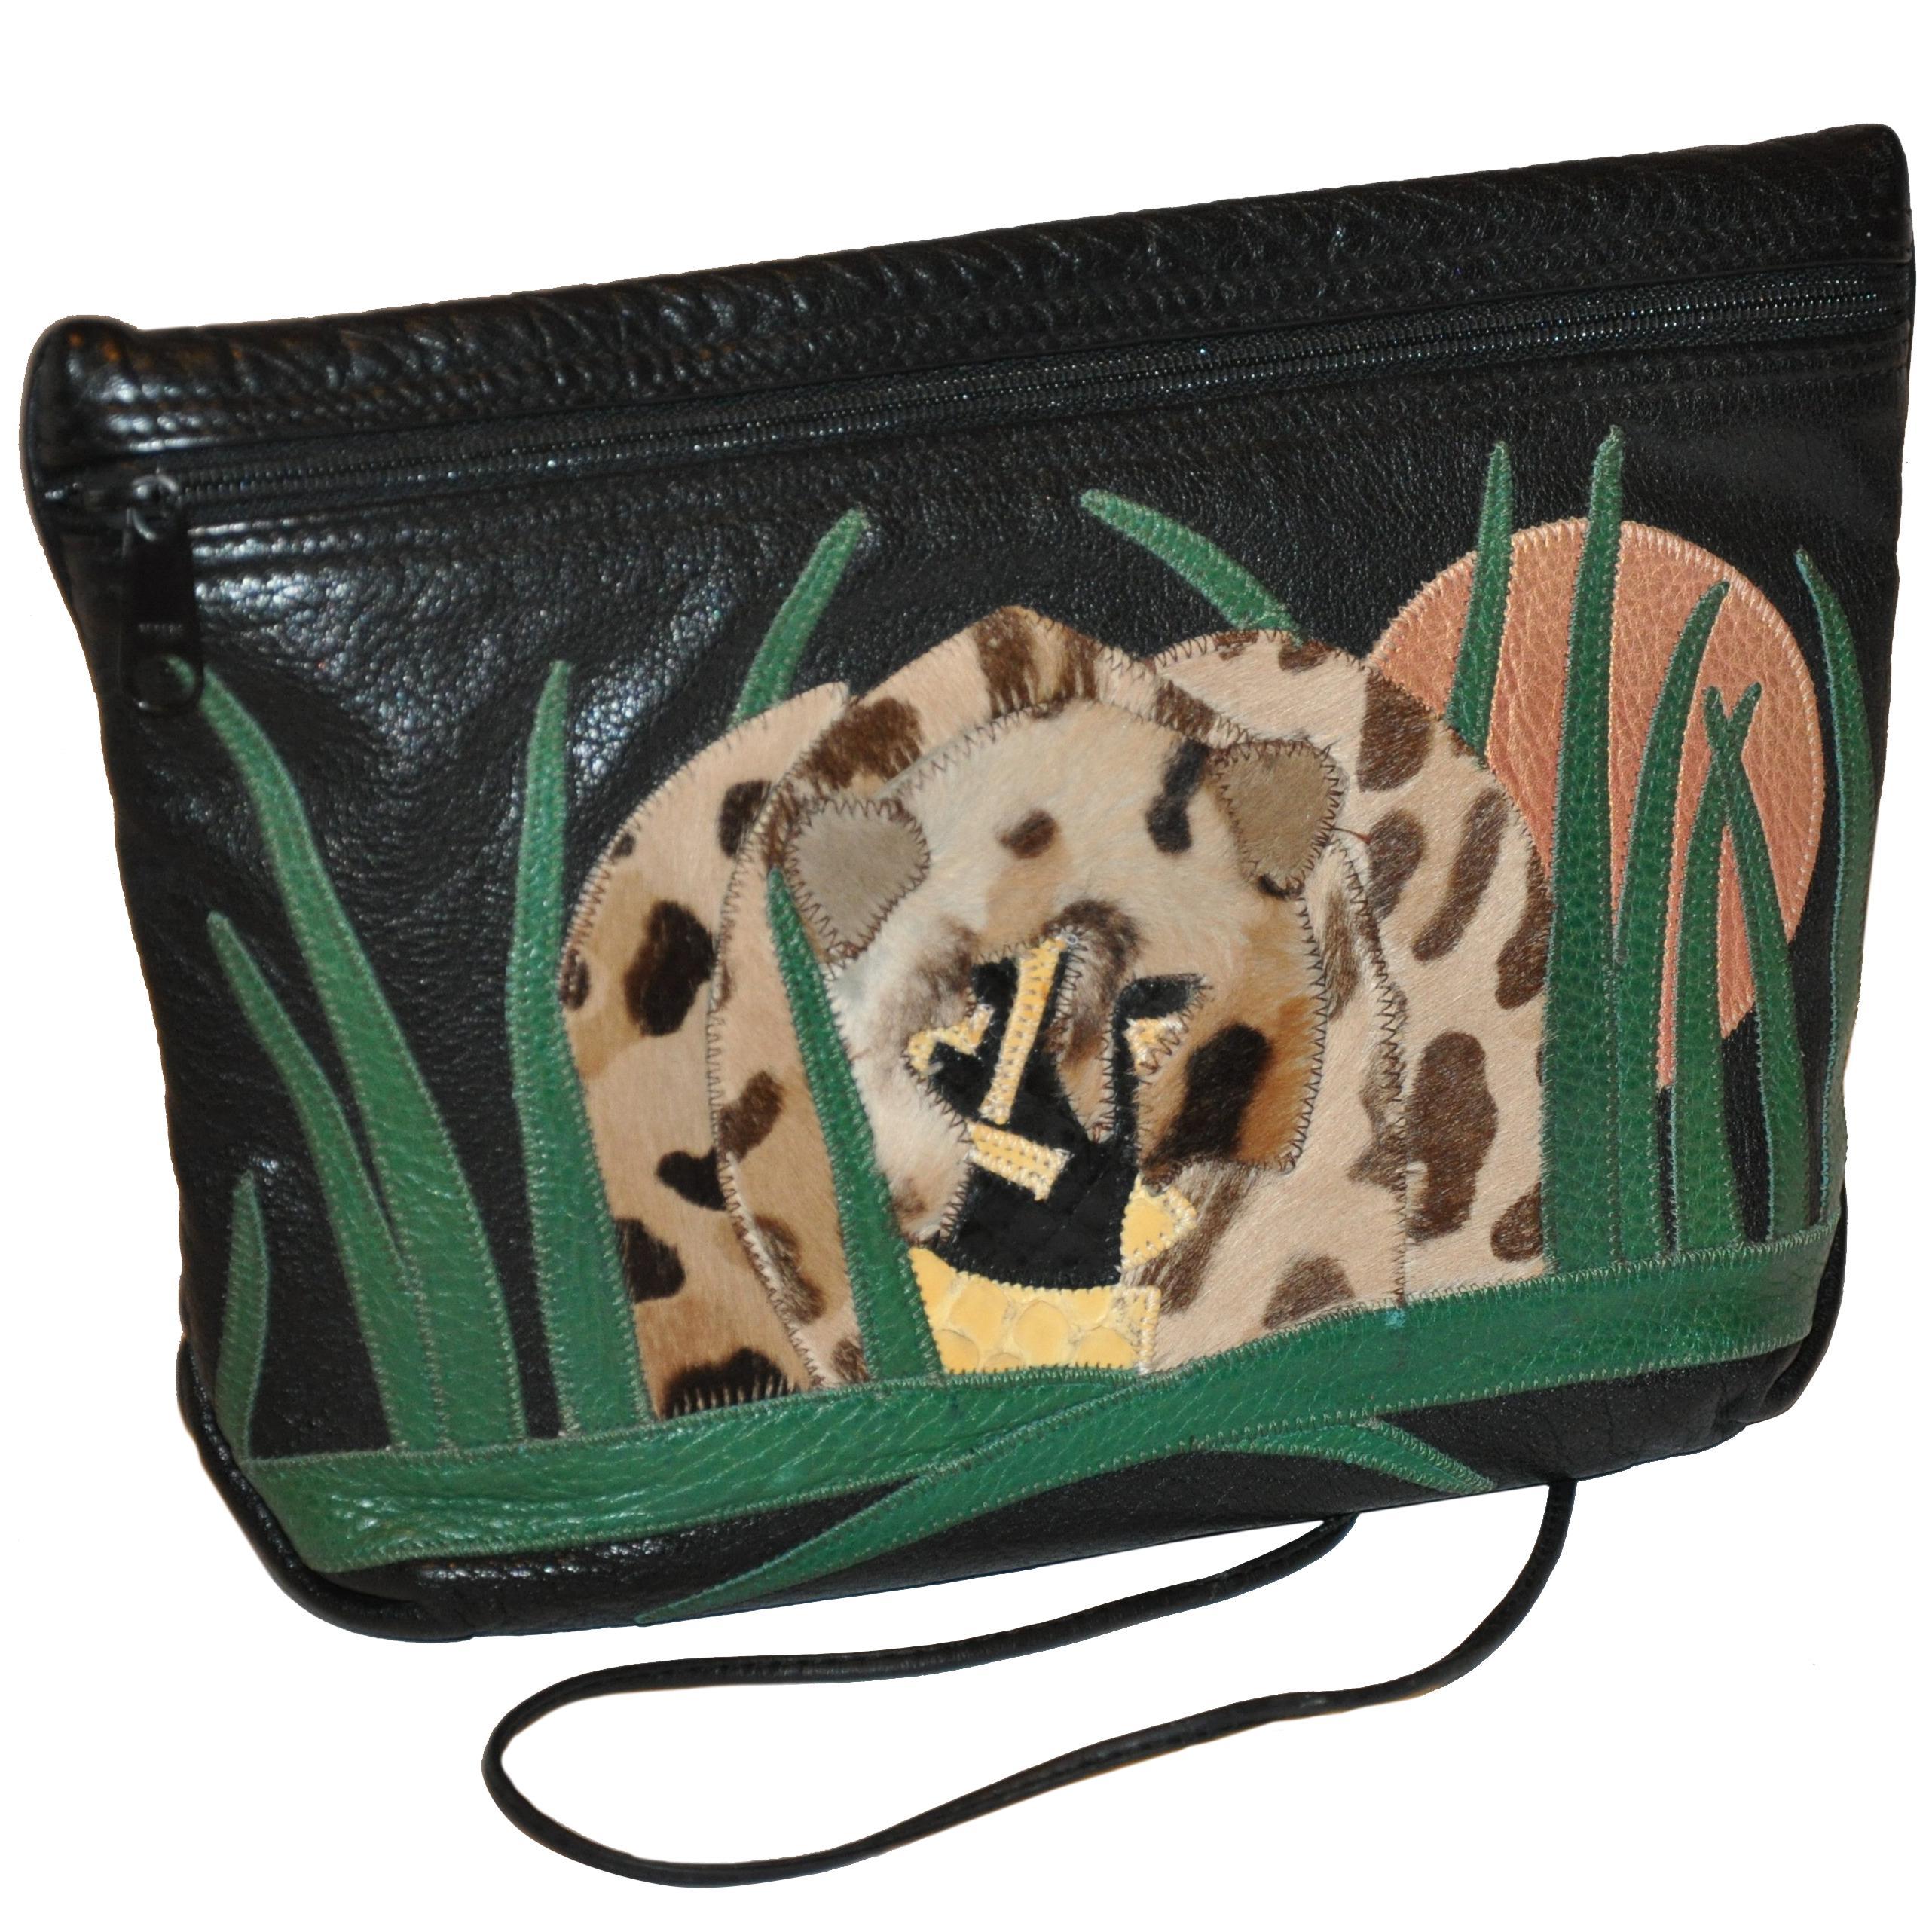 "Carlos Falchi Textured Calfskin Zippered Patchwork ""Jungle"" Scene Shoulder Bag"